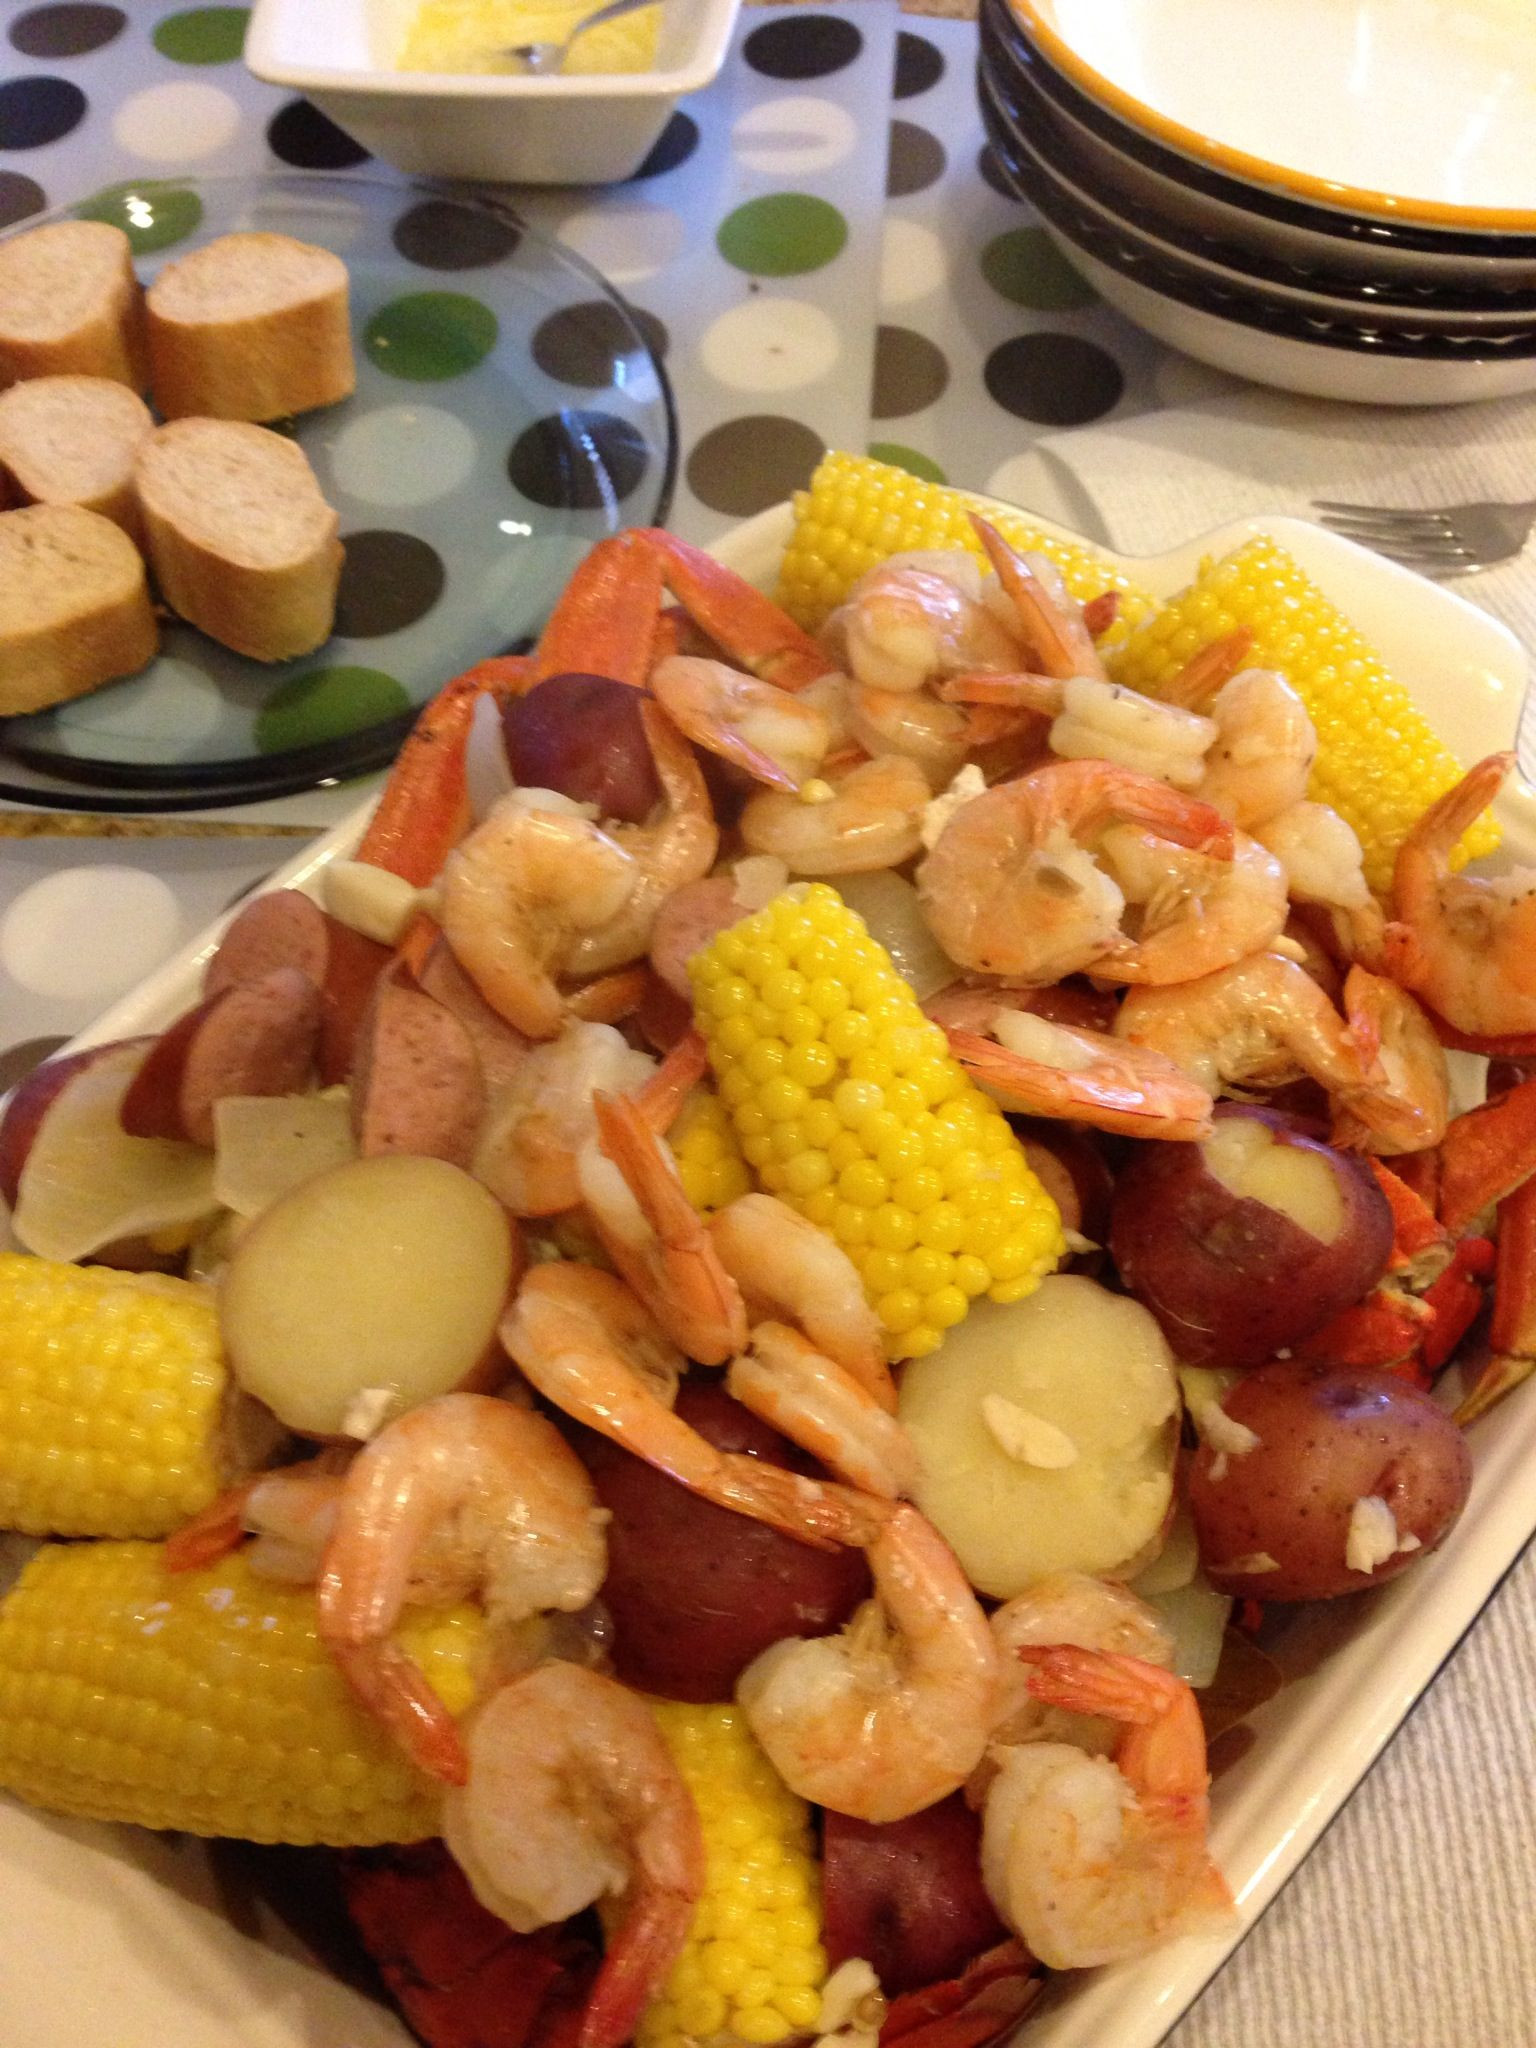 Shrimp Potatoes Corn Sausage Boil  Seafood Boil lobster crab shrimp sausage corn